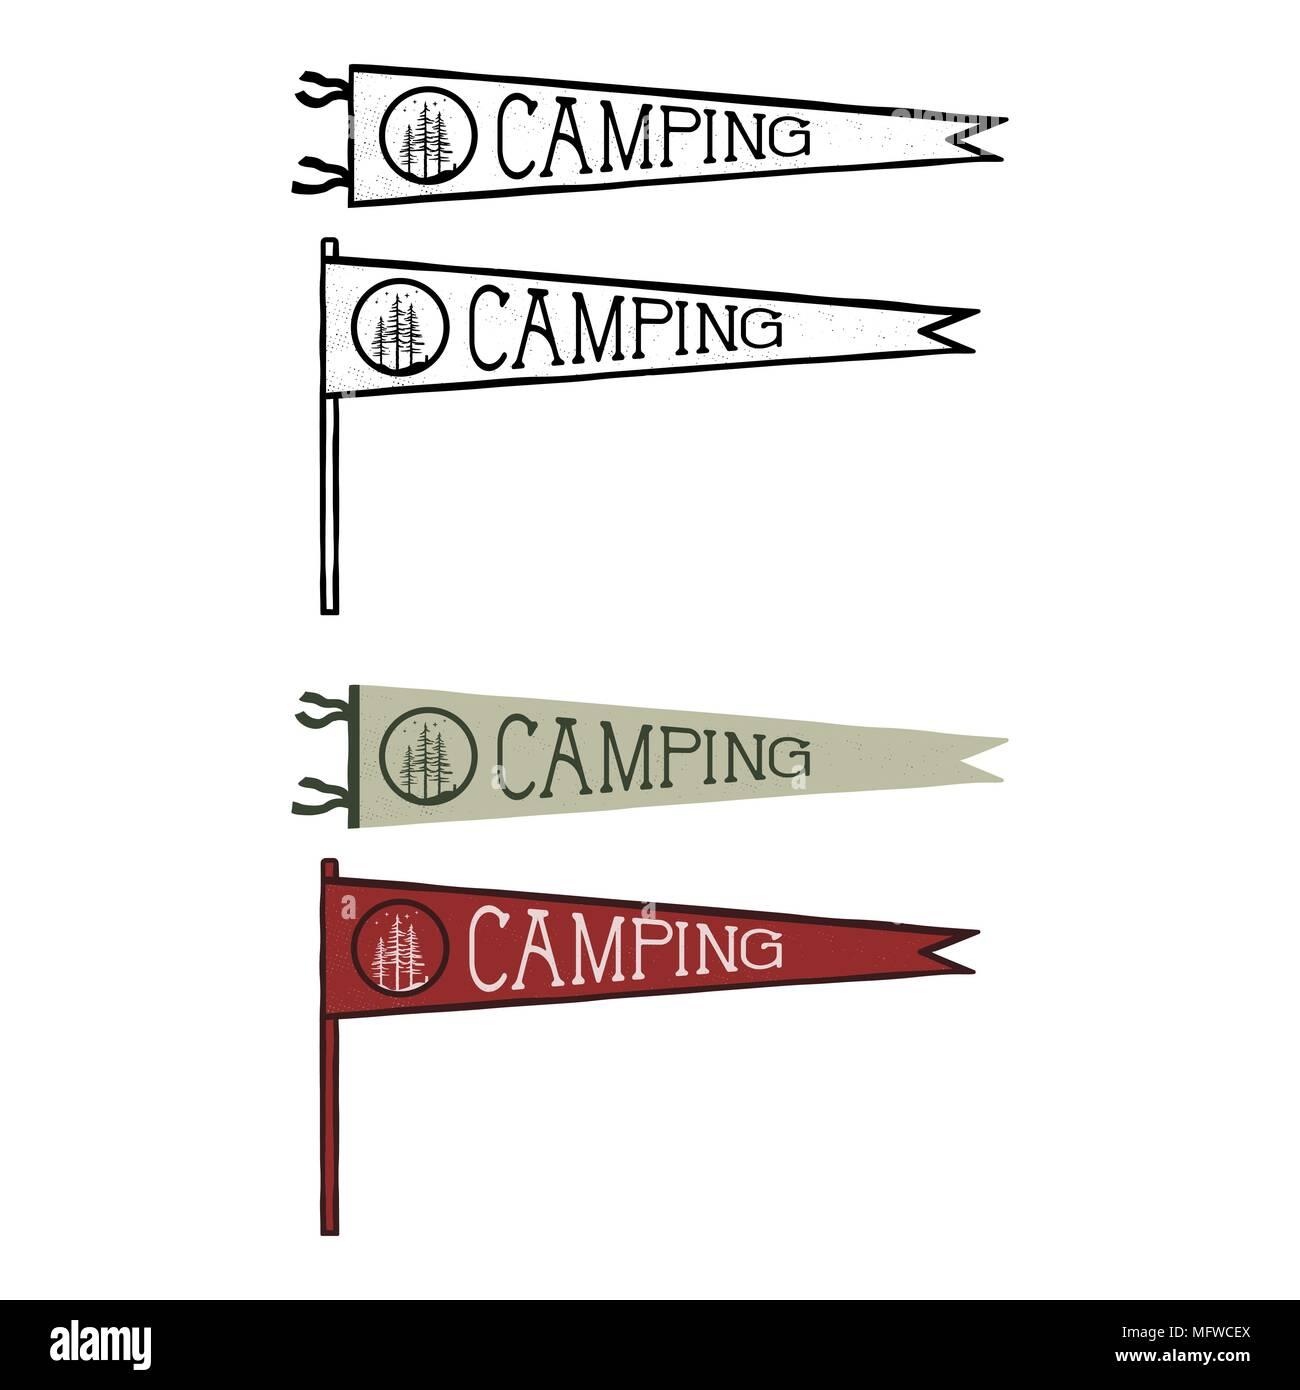 Atemberaubend Camping Färbung Seite Bilder - Entry Level Resume ...